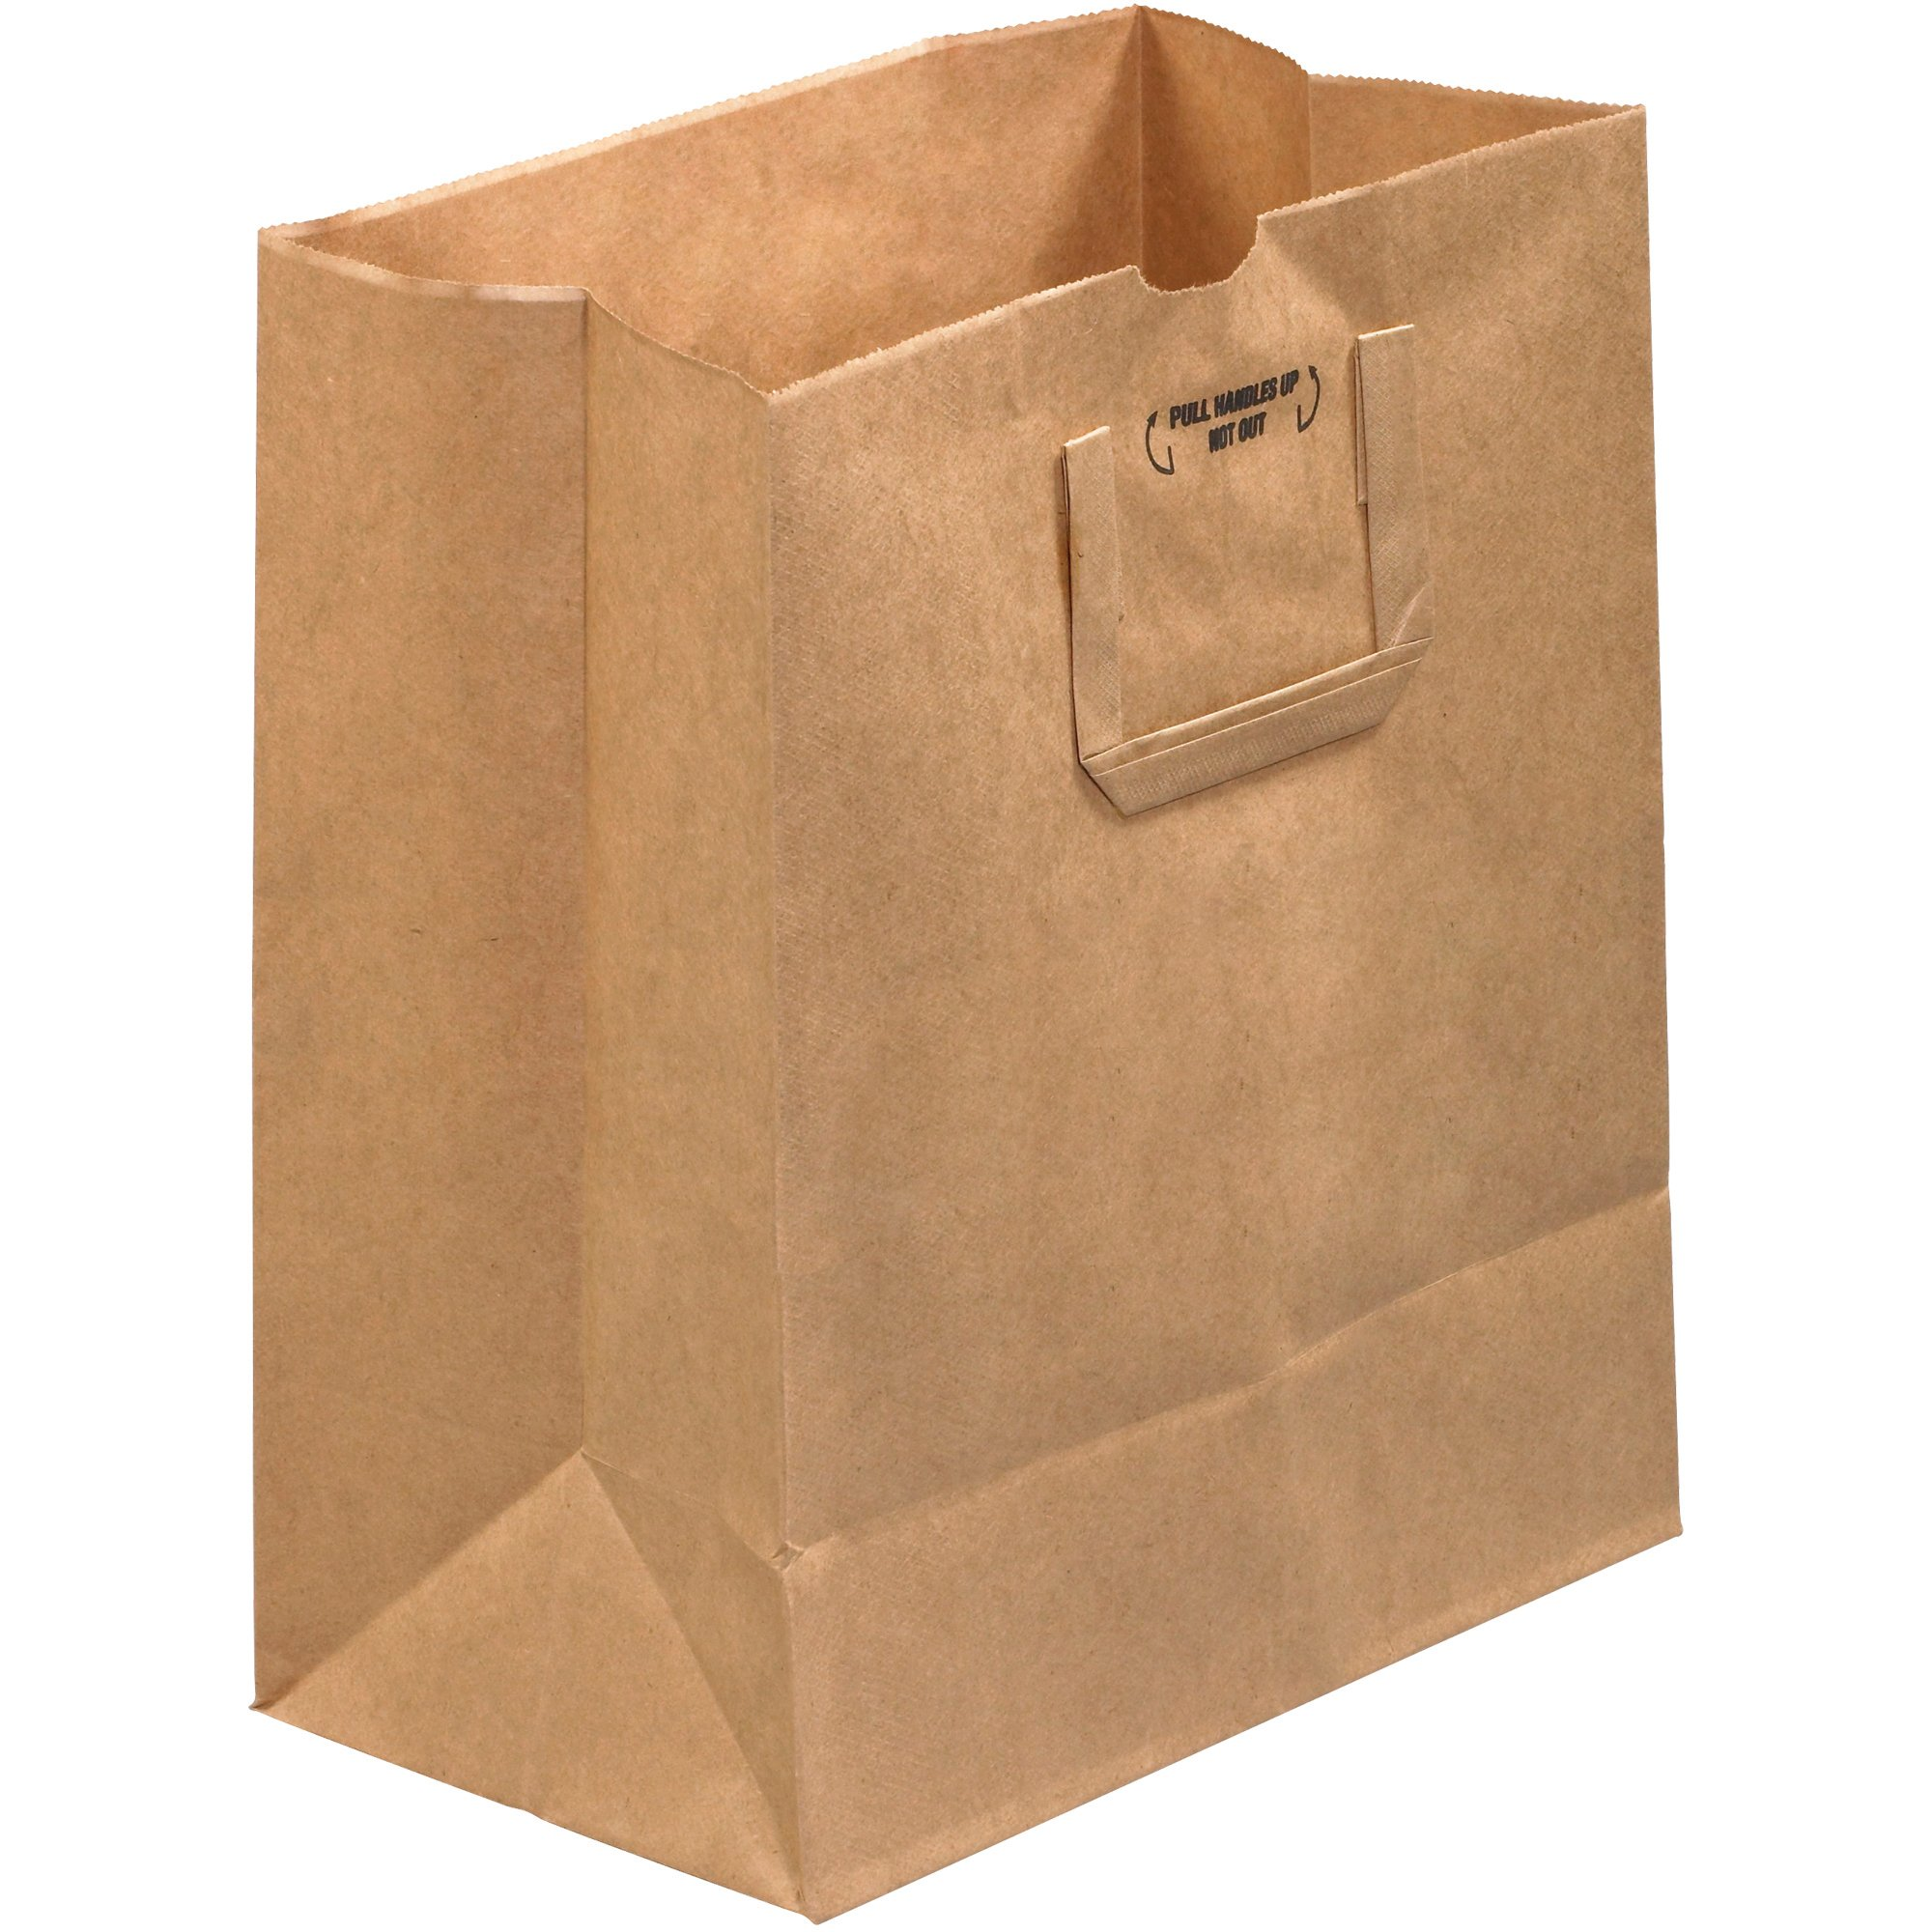 Aviditi BGFH101D Flat Handle Grocery Paper Bag, 7'' Length x 12'' Width x 14'' Height, Kraft (Case of 300) by Aviditi